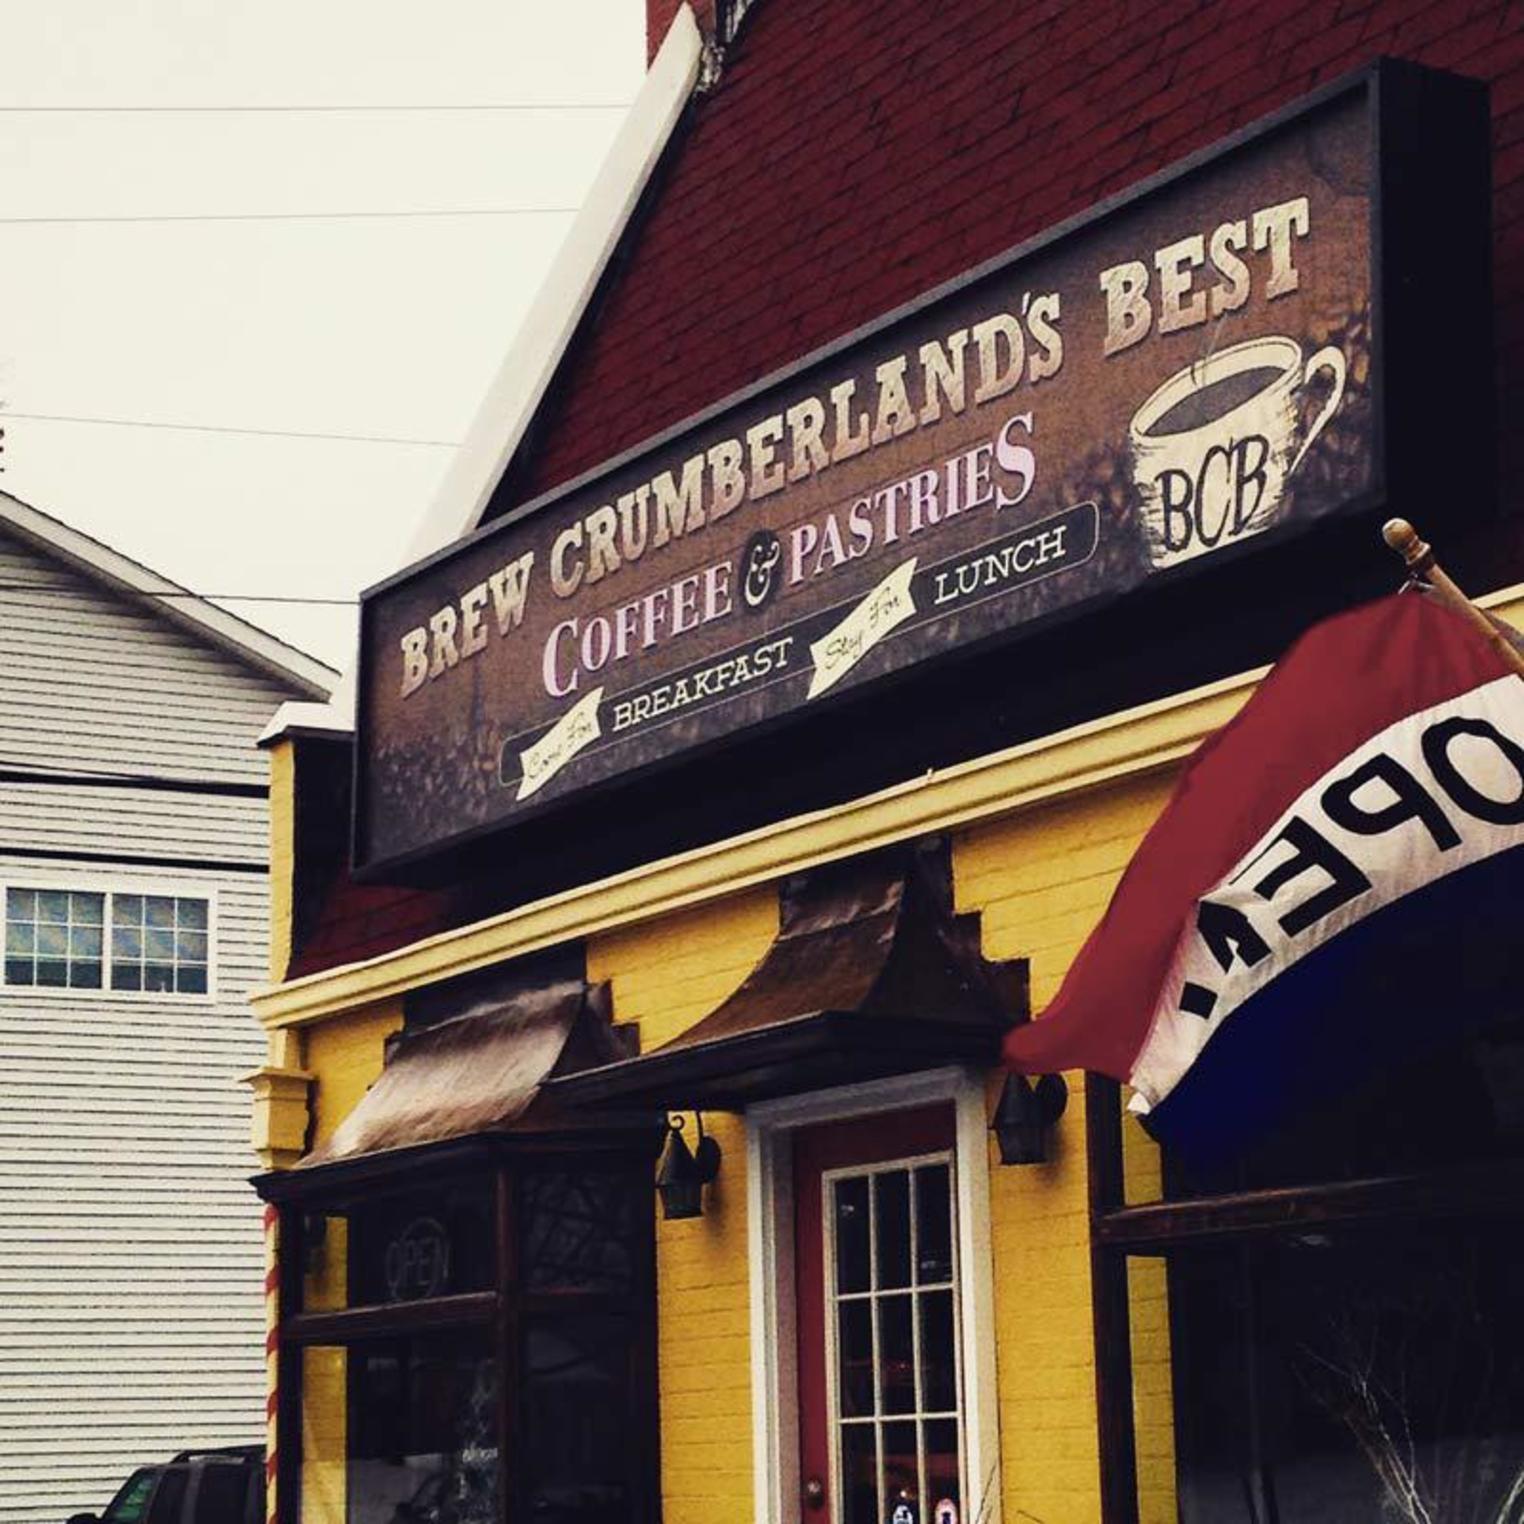 Brew Crumberland's Best